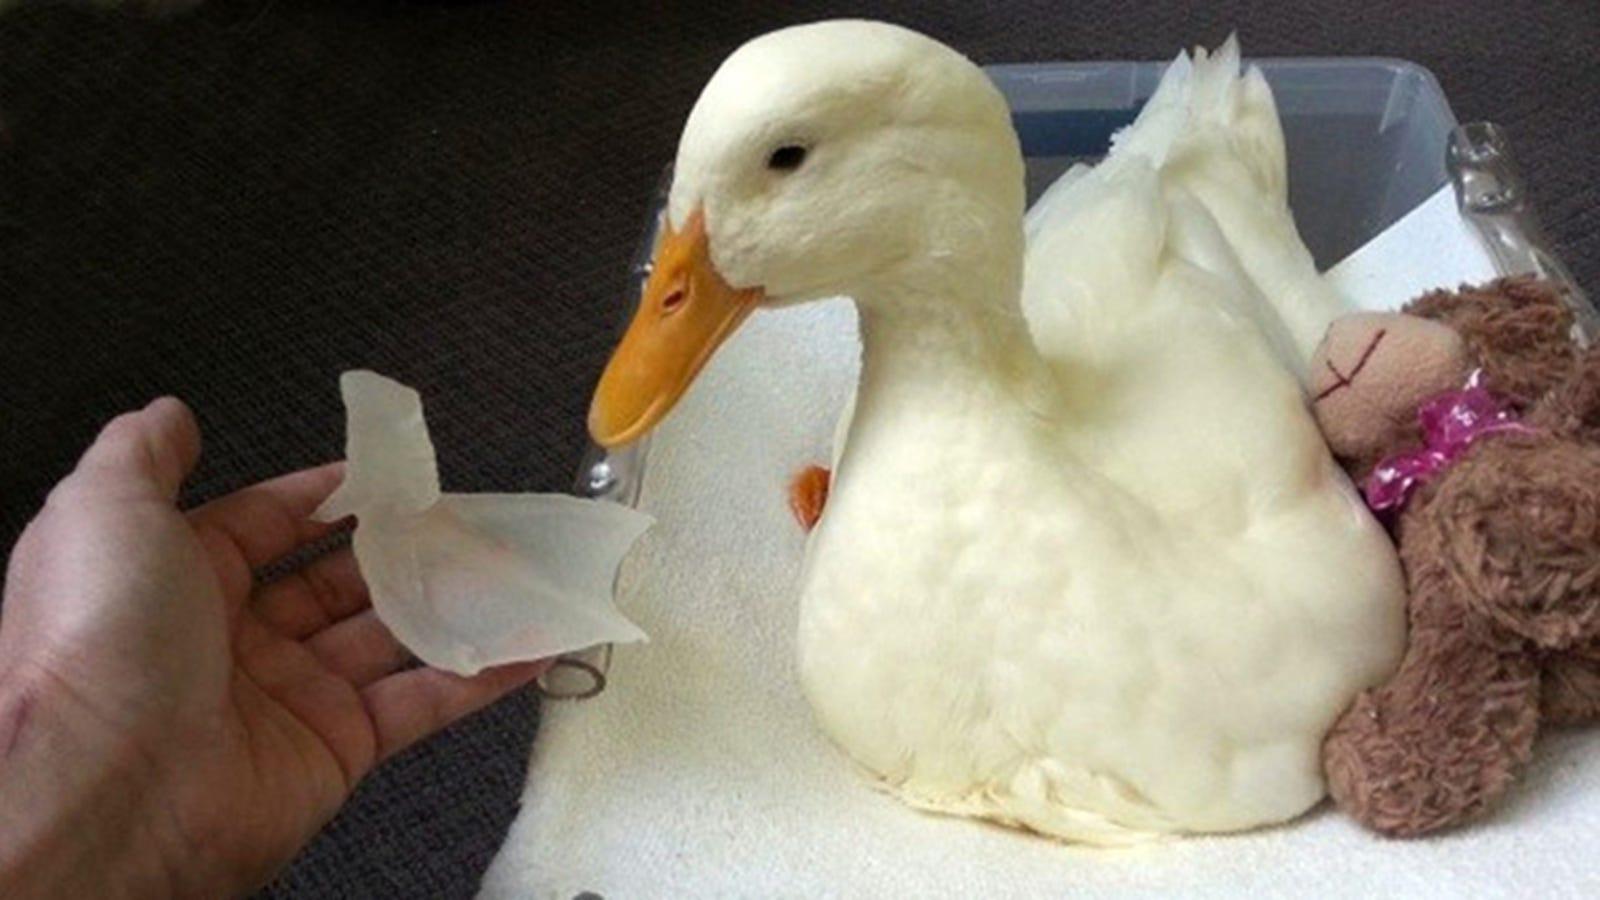 Un pato vuelve a caminar gracias a una impresora 3D